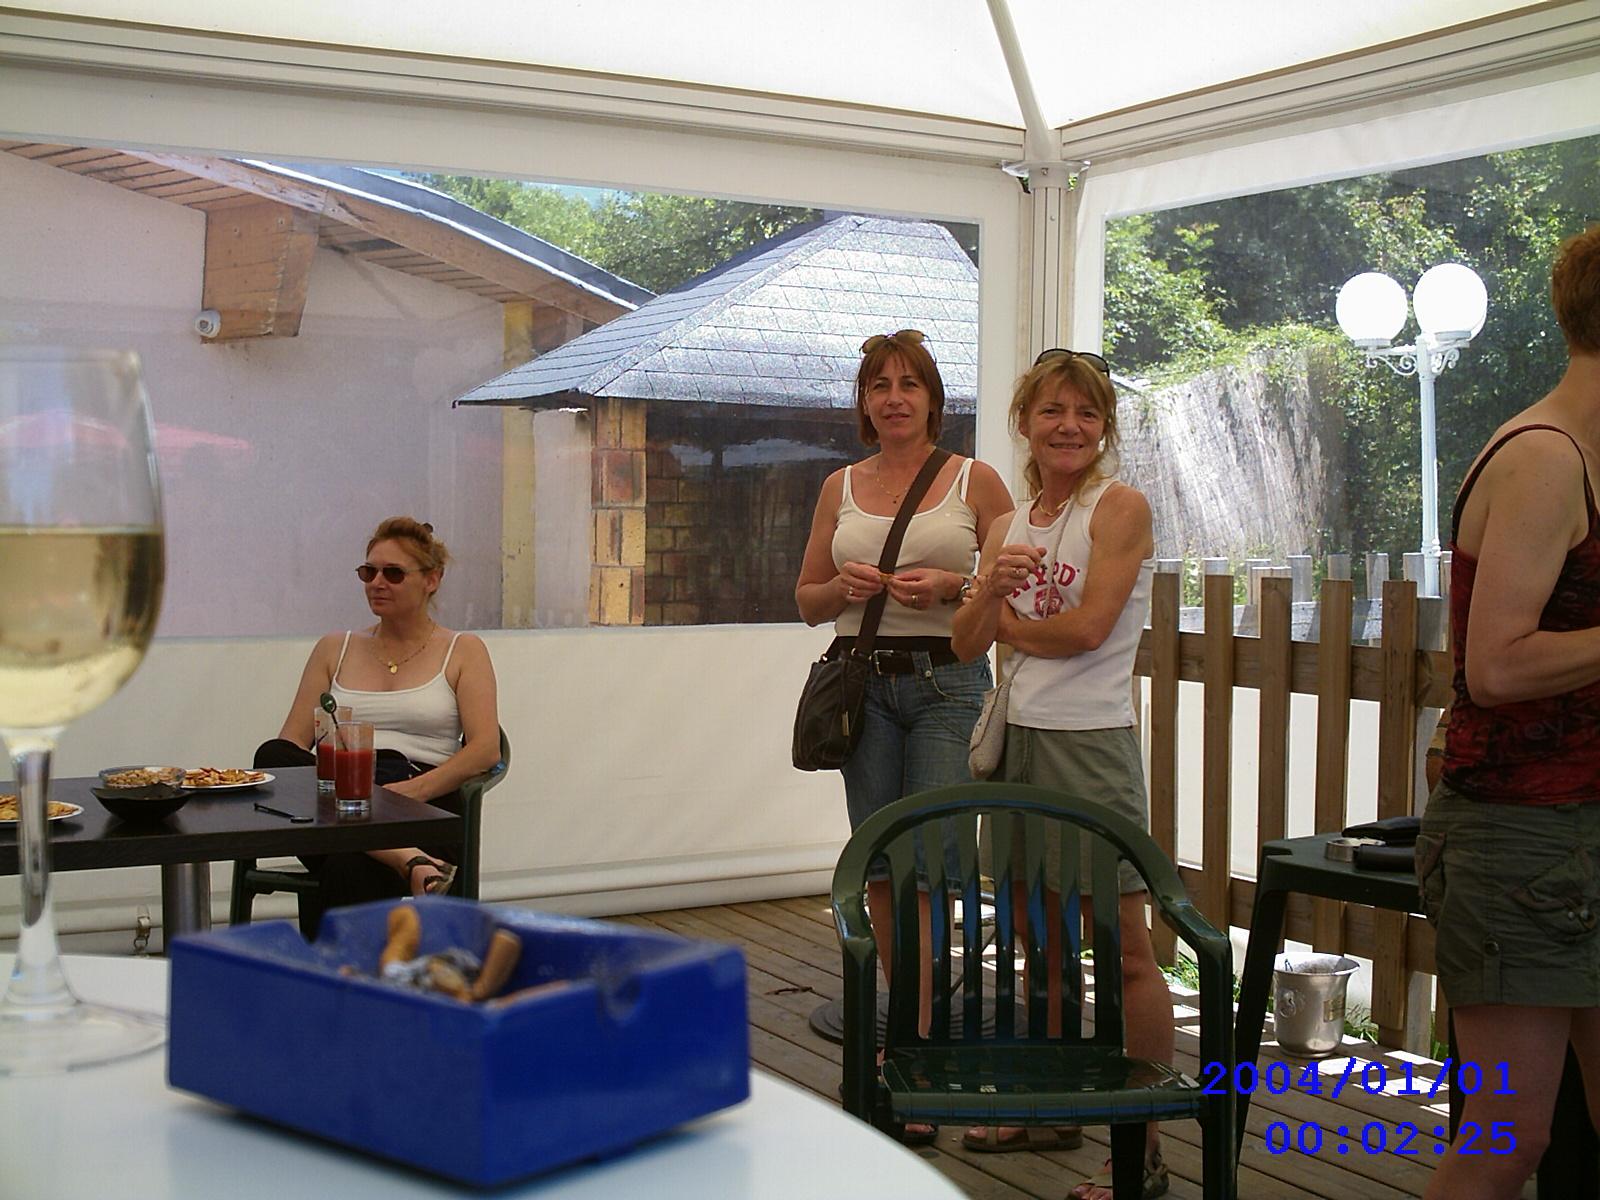 barbeclesolympiensjuin20081.jpg